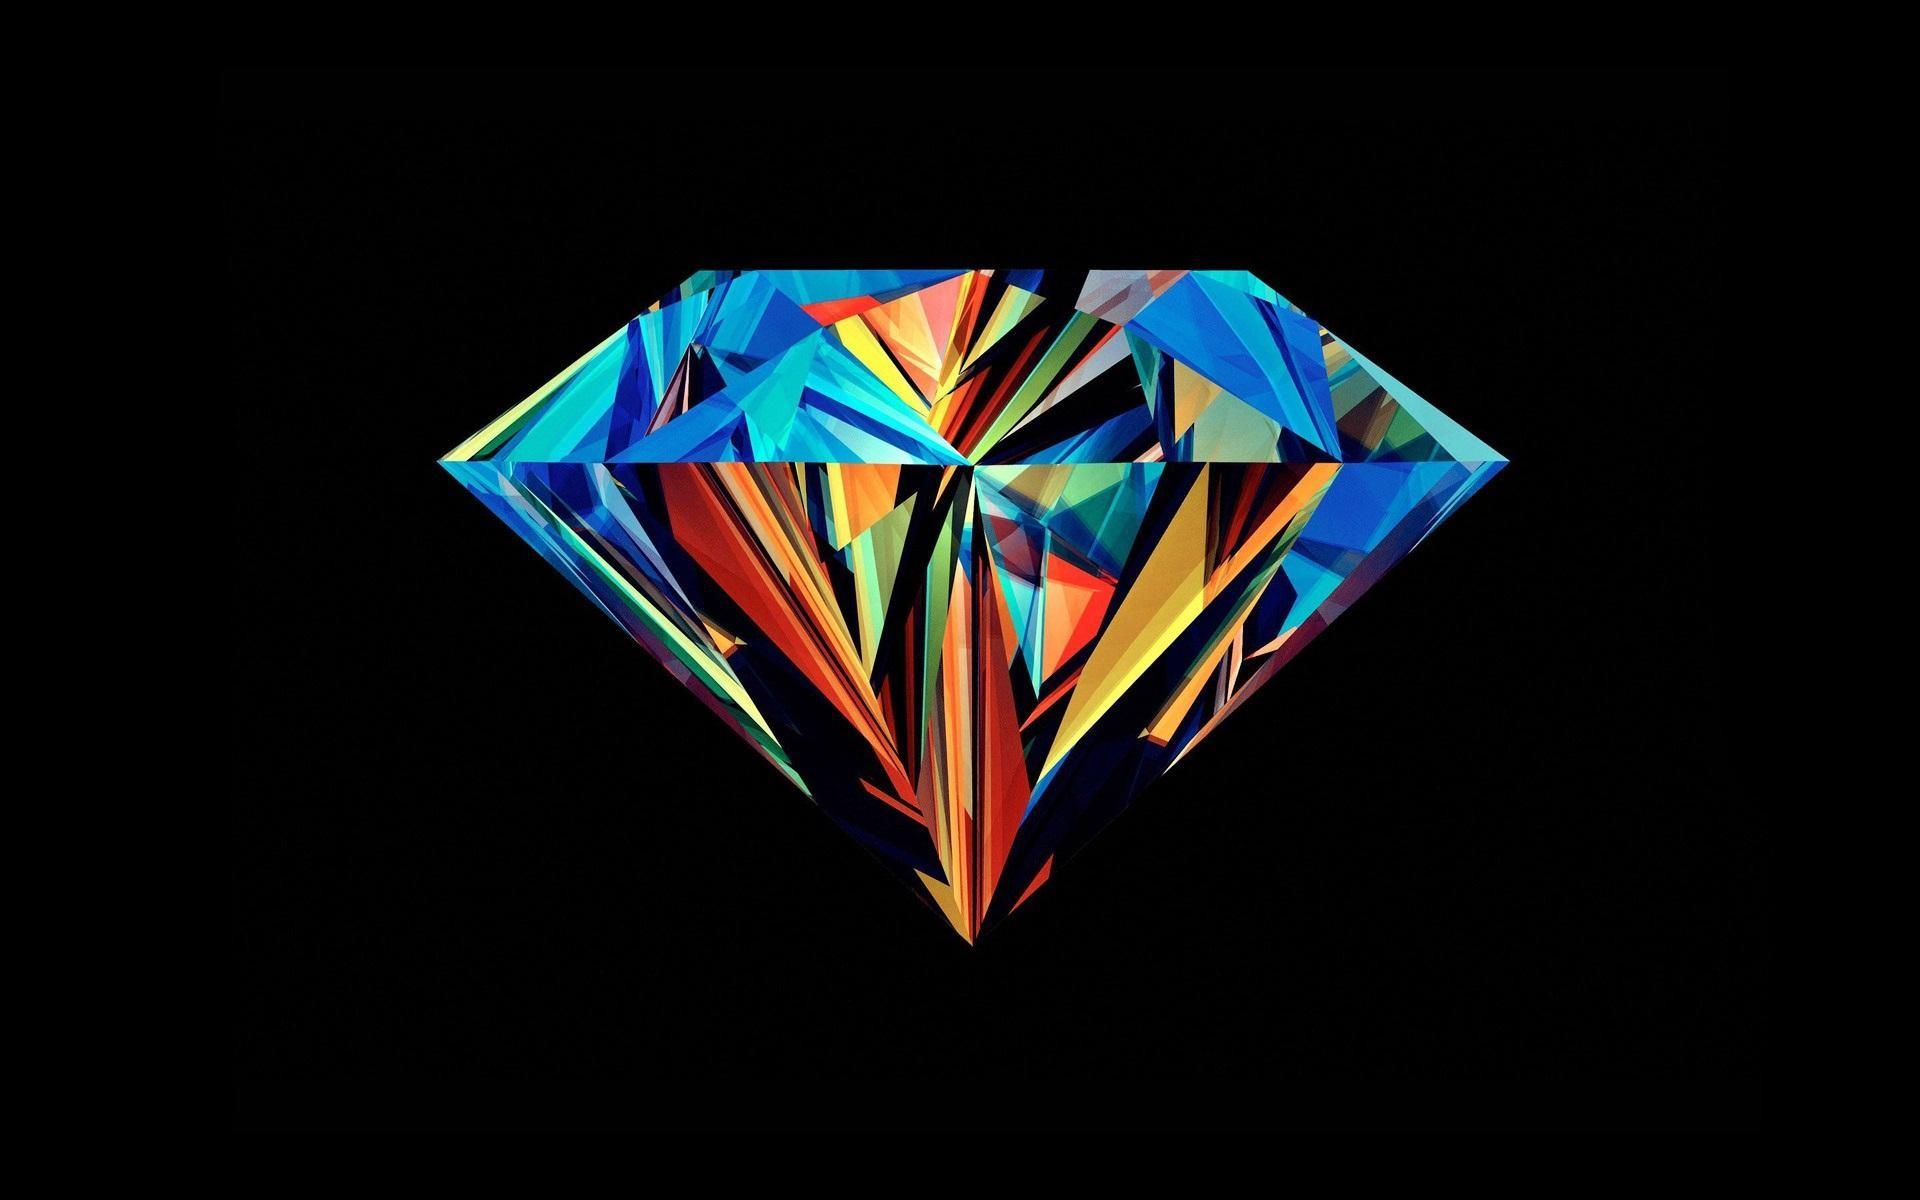 Sick background impremedia backgrounds for sick diamond background 8backgrounds voltagebd Gallery